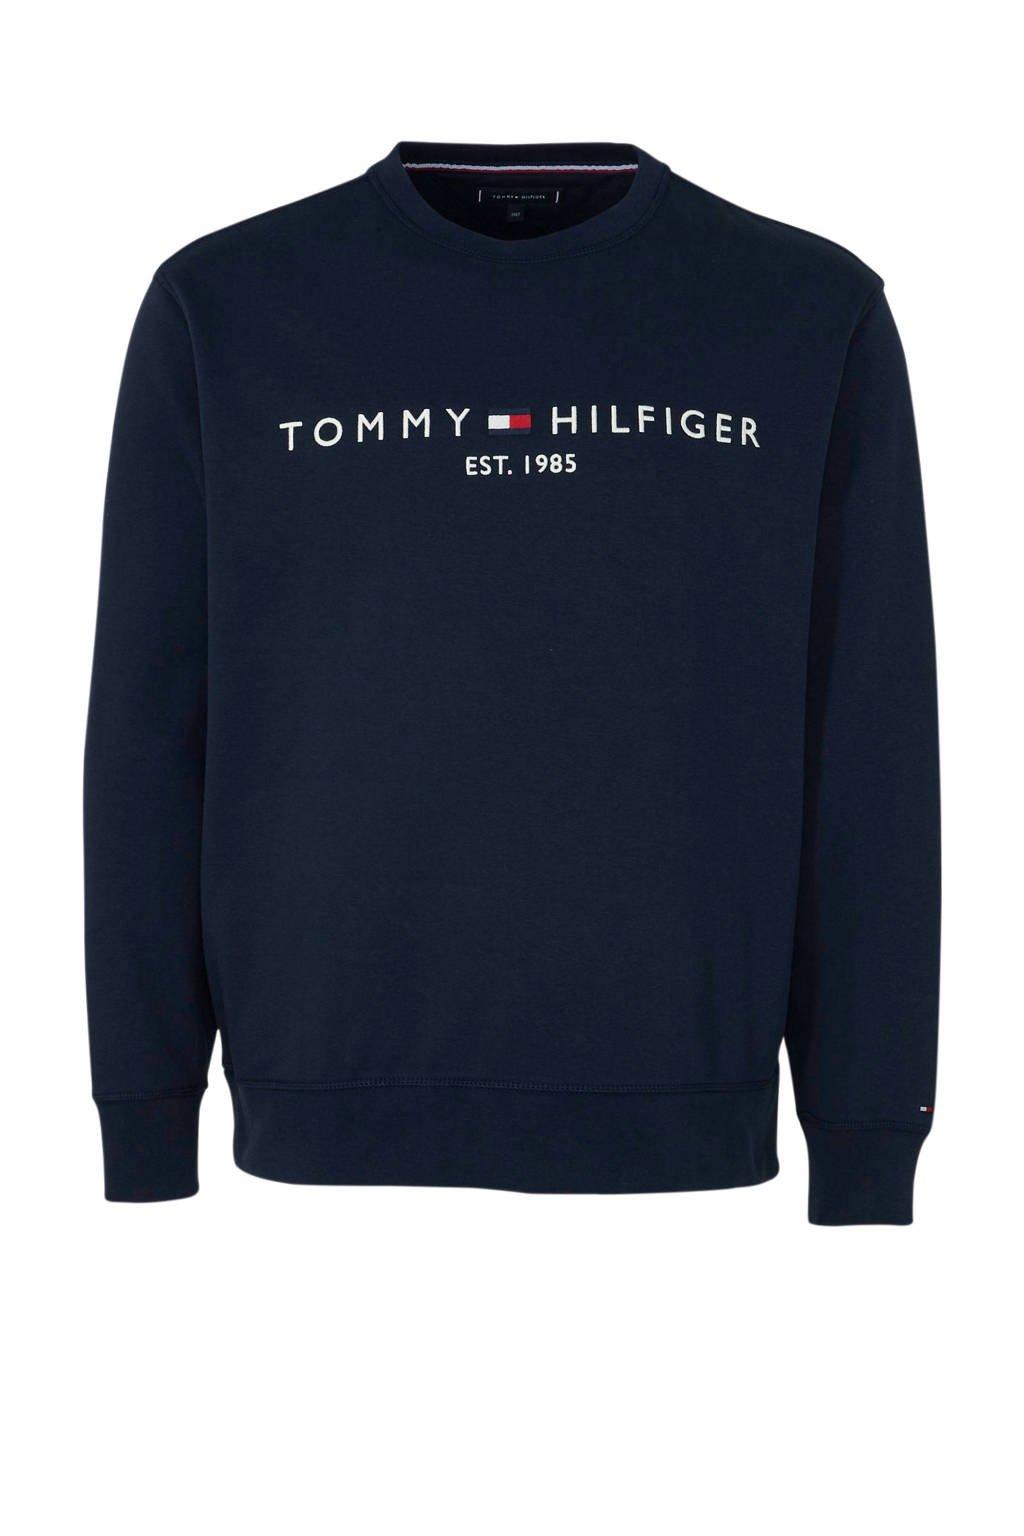 Tommy Hilfiger Big & Tall +size sweater met logo marine, Marine